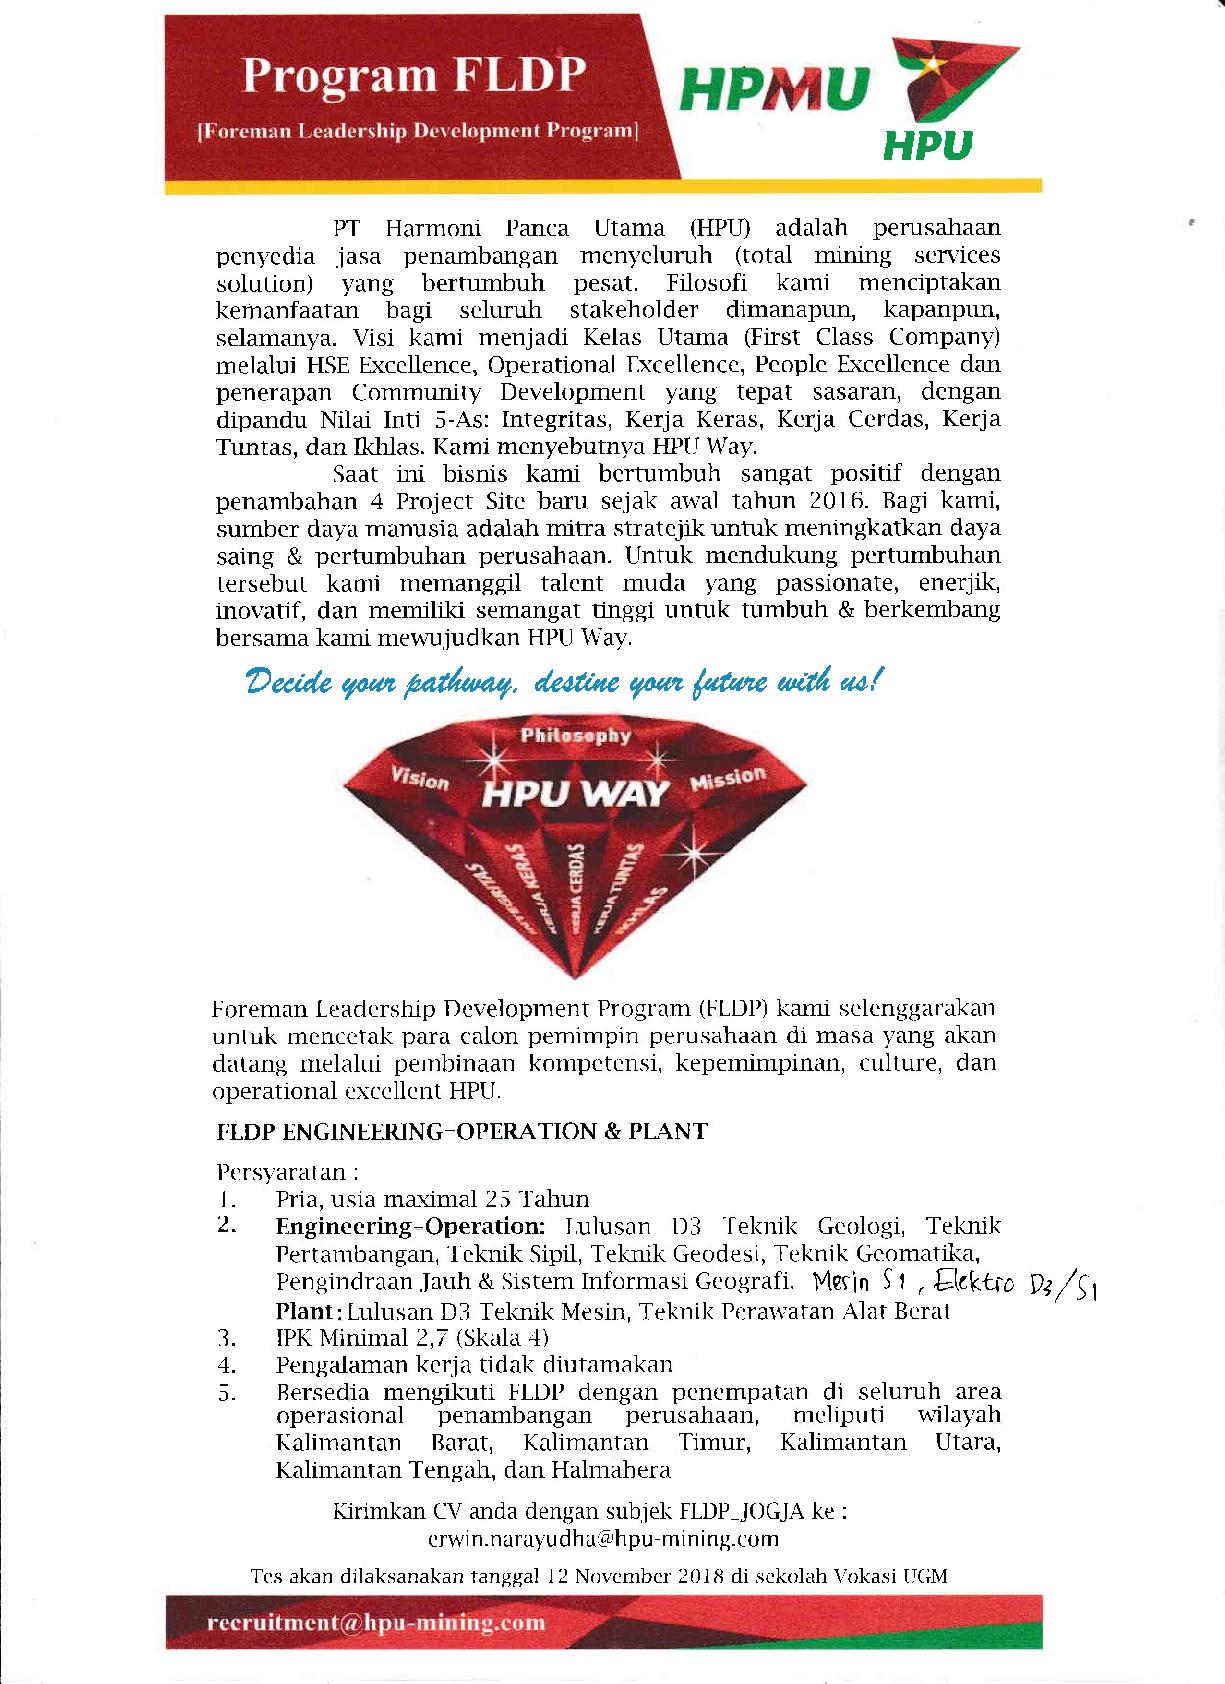 PROGRAM FLDP (Foreman Leadership Development Program) PT. HPU